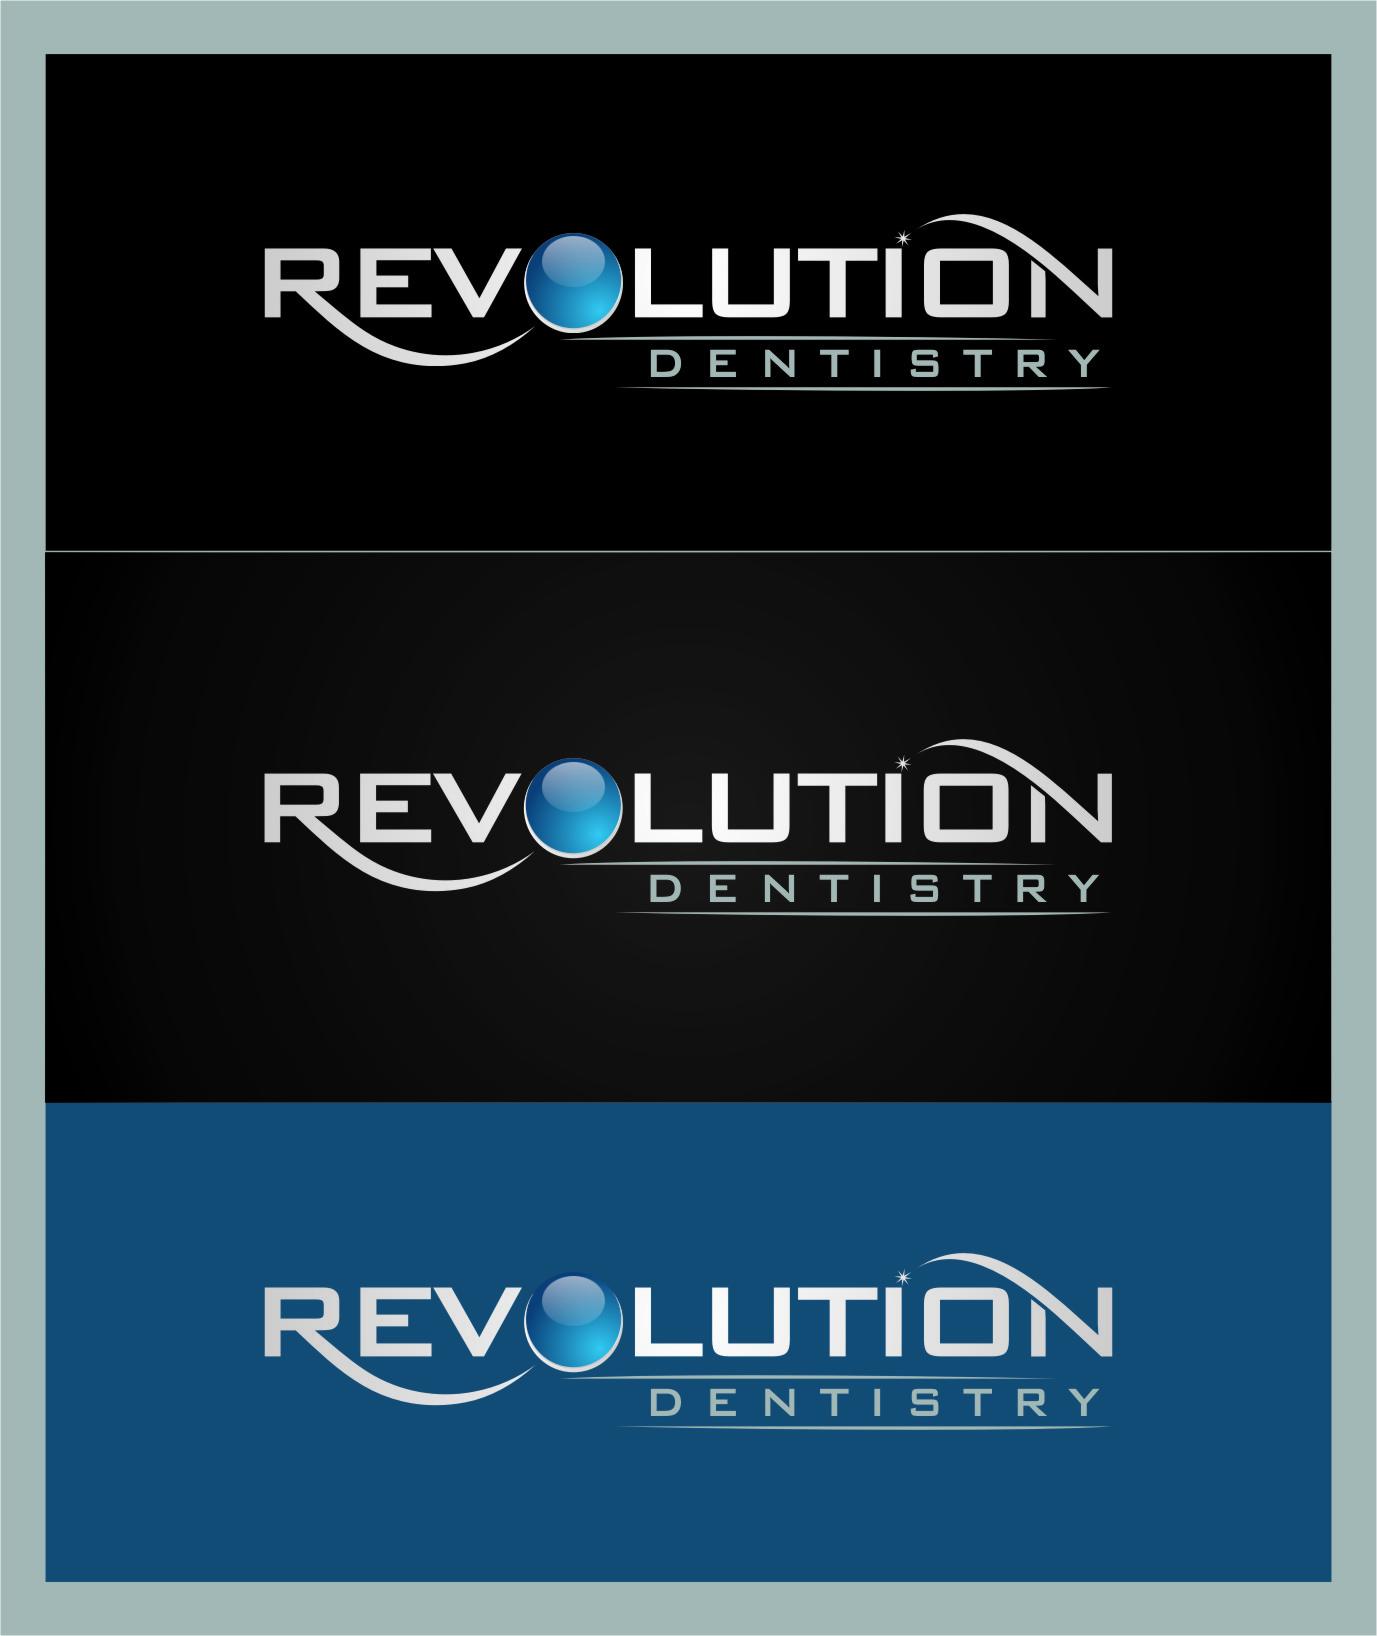 Logo Design by Ngepet_art - Entry No. 129 in the Logo Design Contest Artistic Logo Design for Revolution Dentistry.